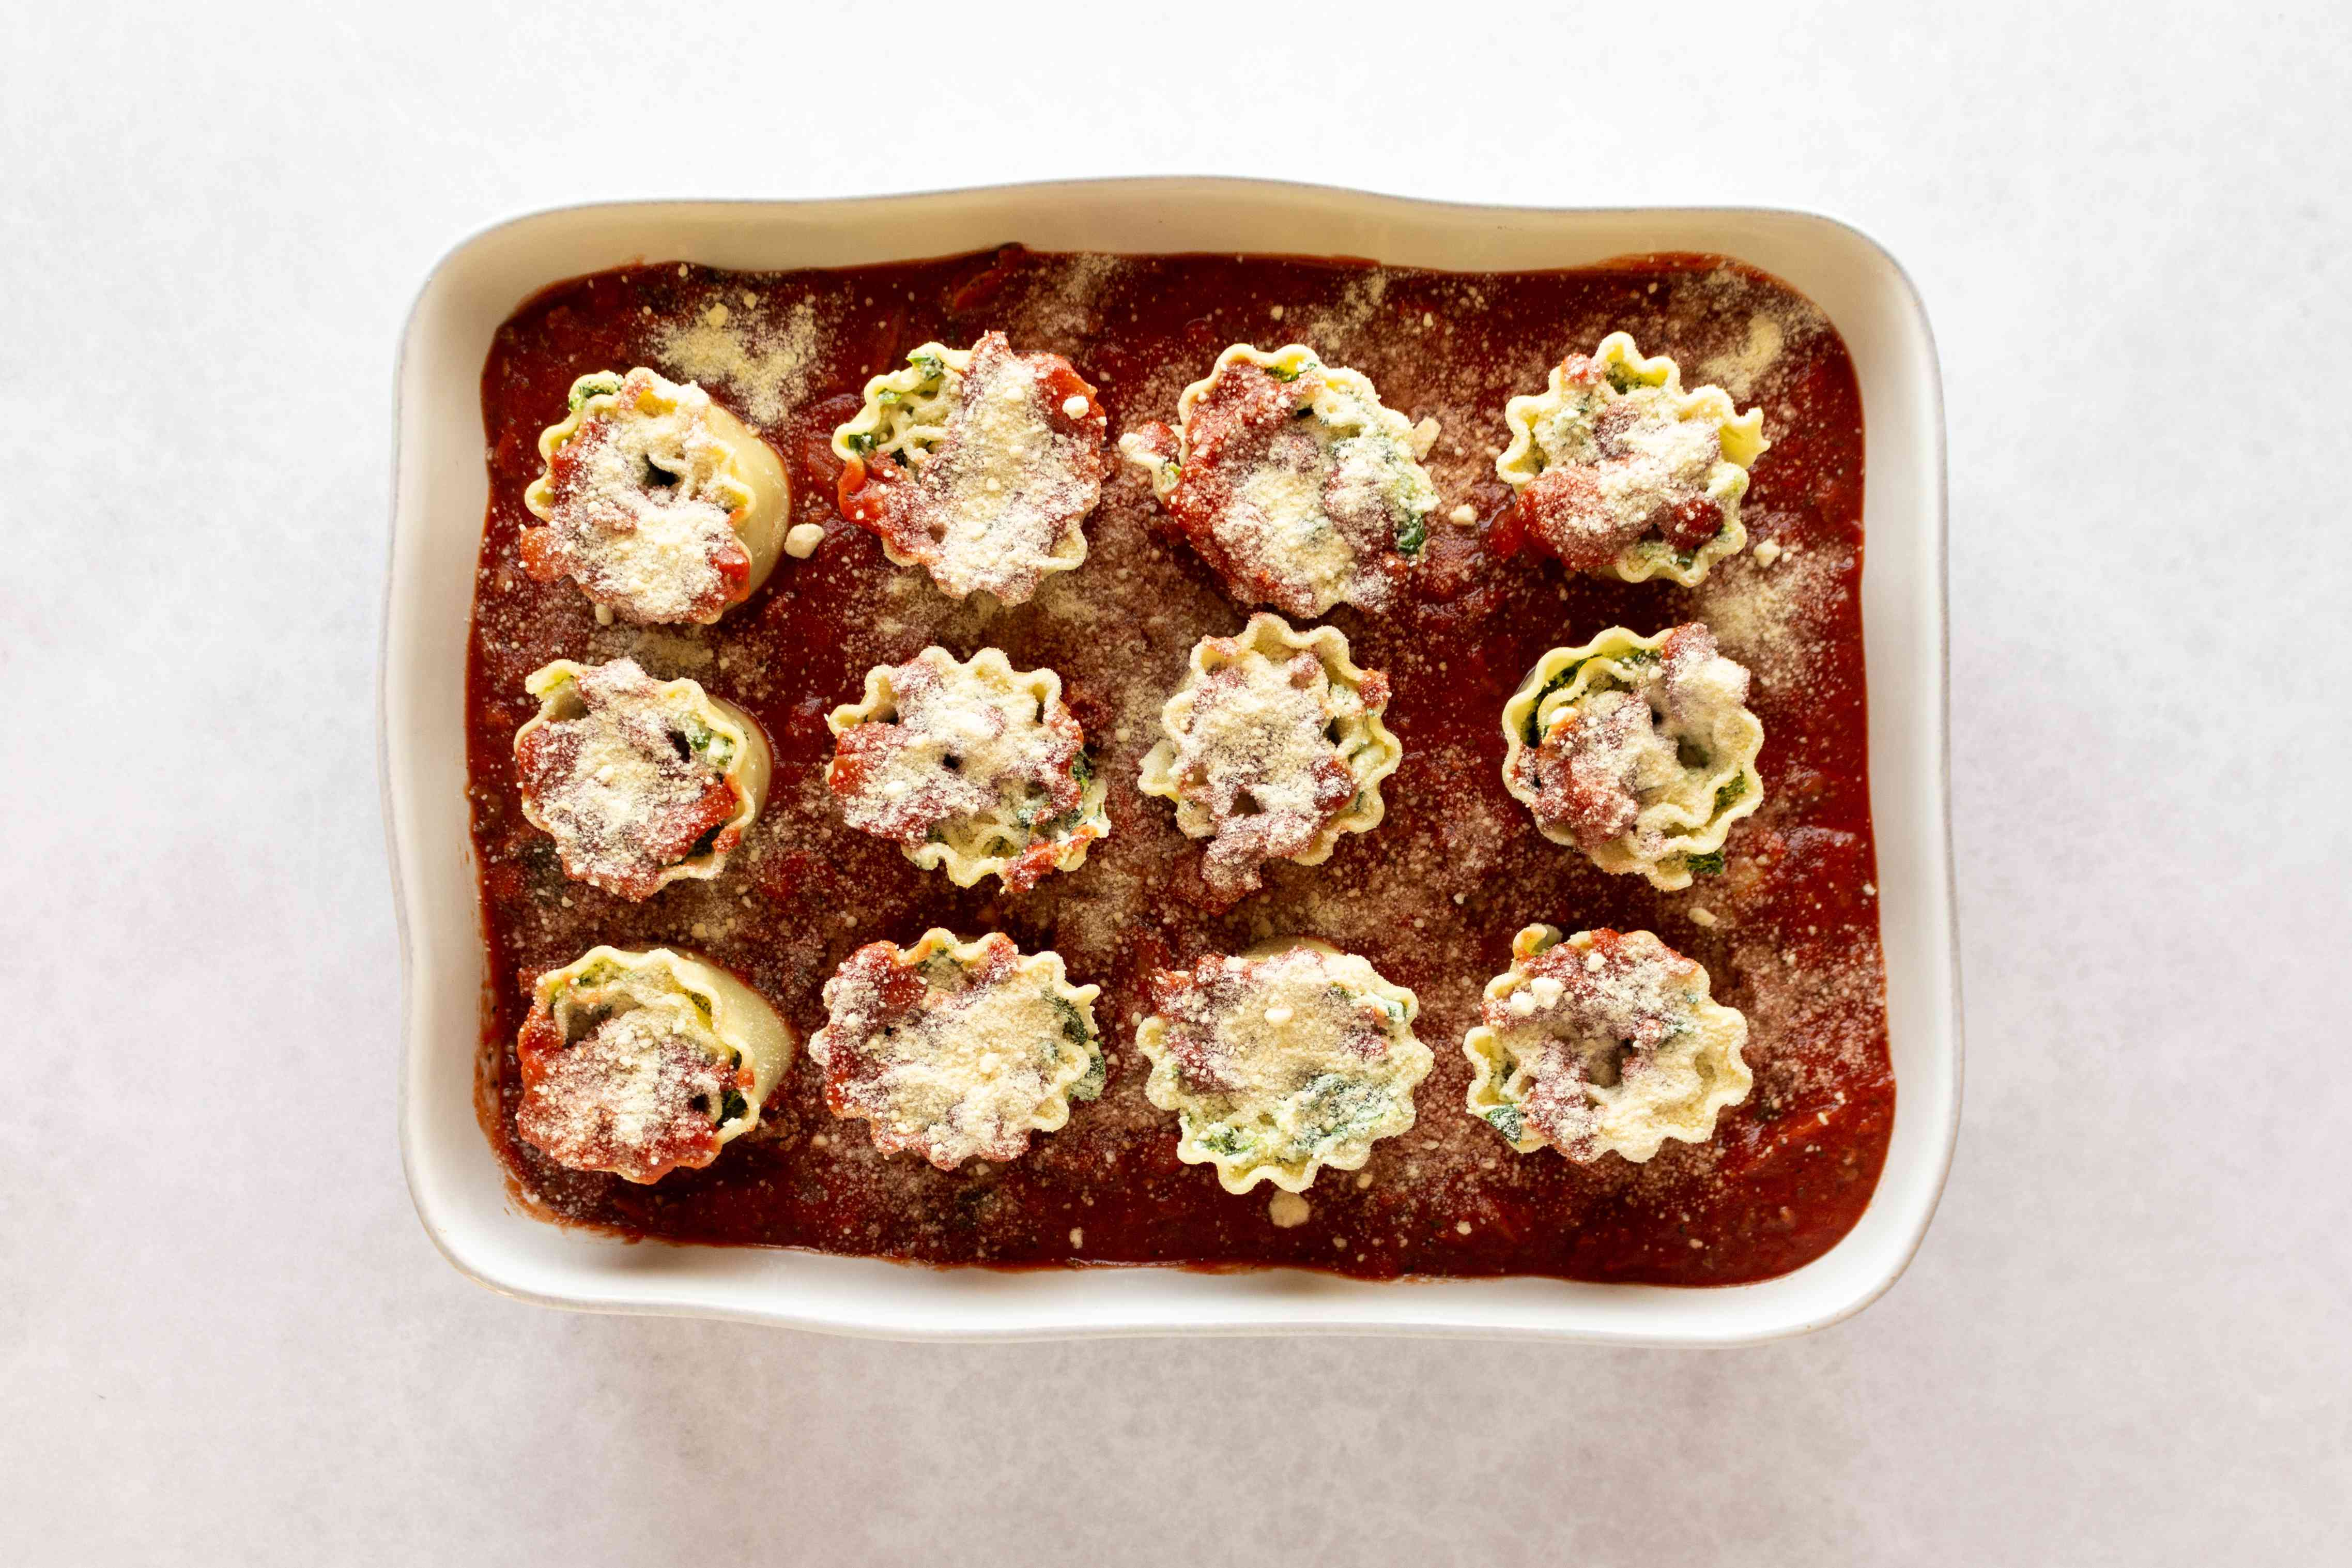 Spinach Lasagna Roll-Ups in a baking dish